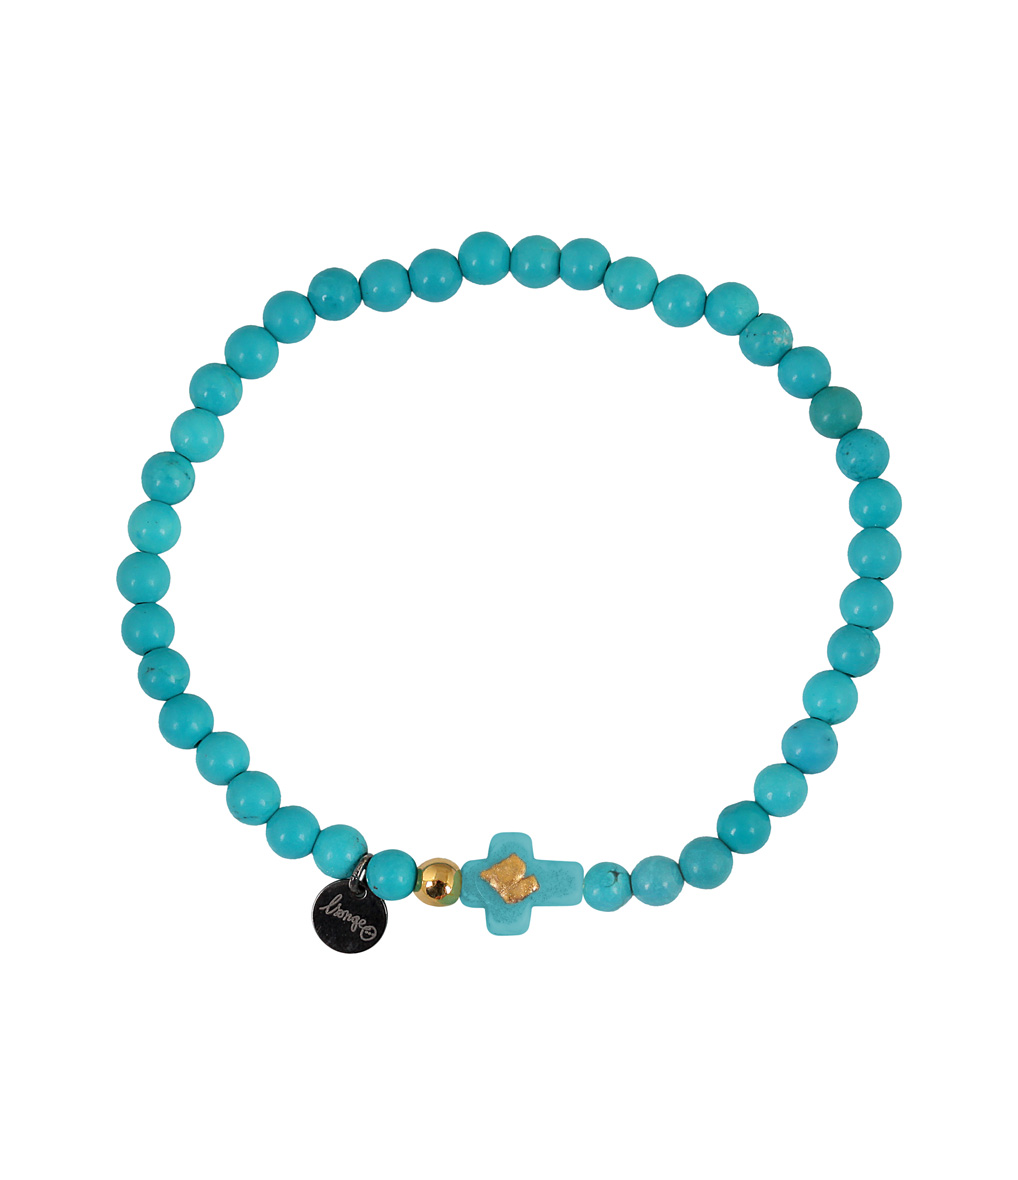 Bracelet Croix Perles Turquoise